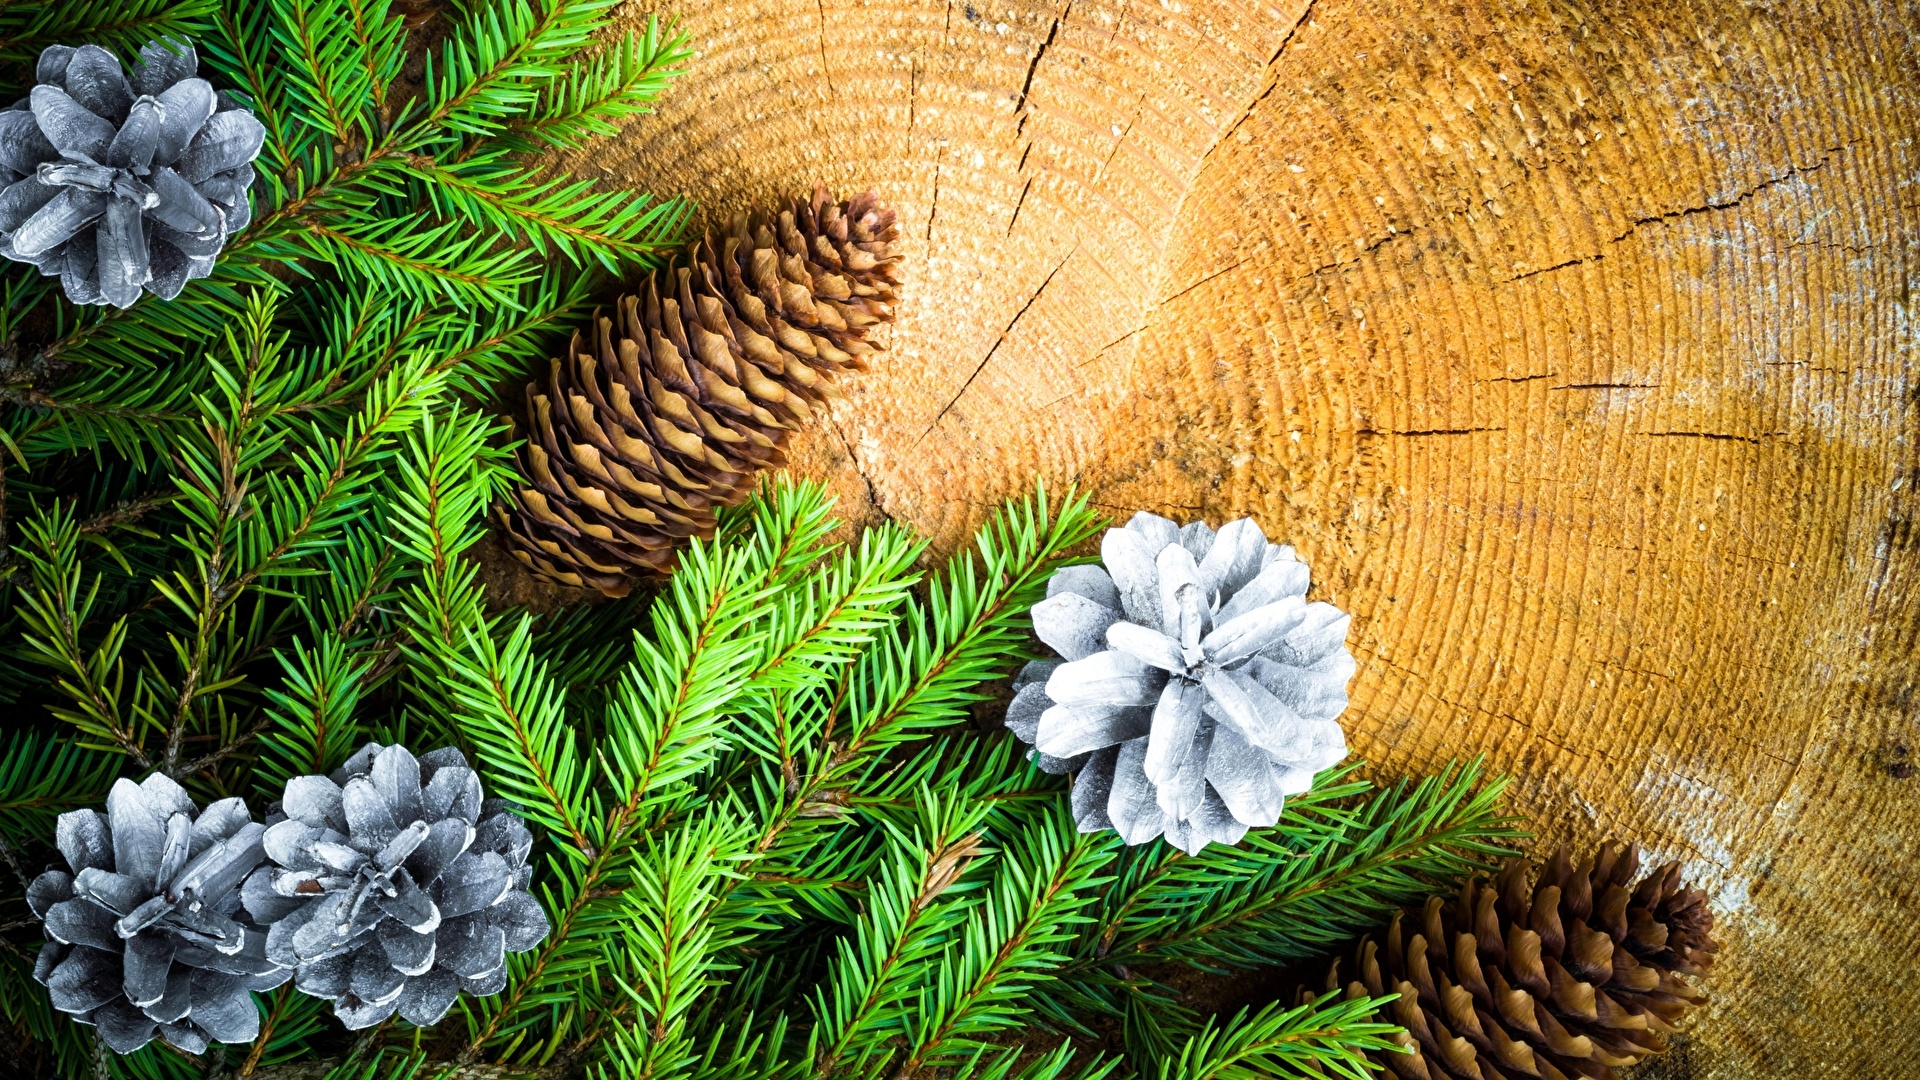 Pine Cone Image